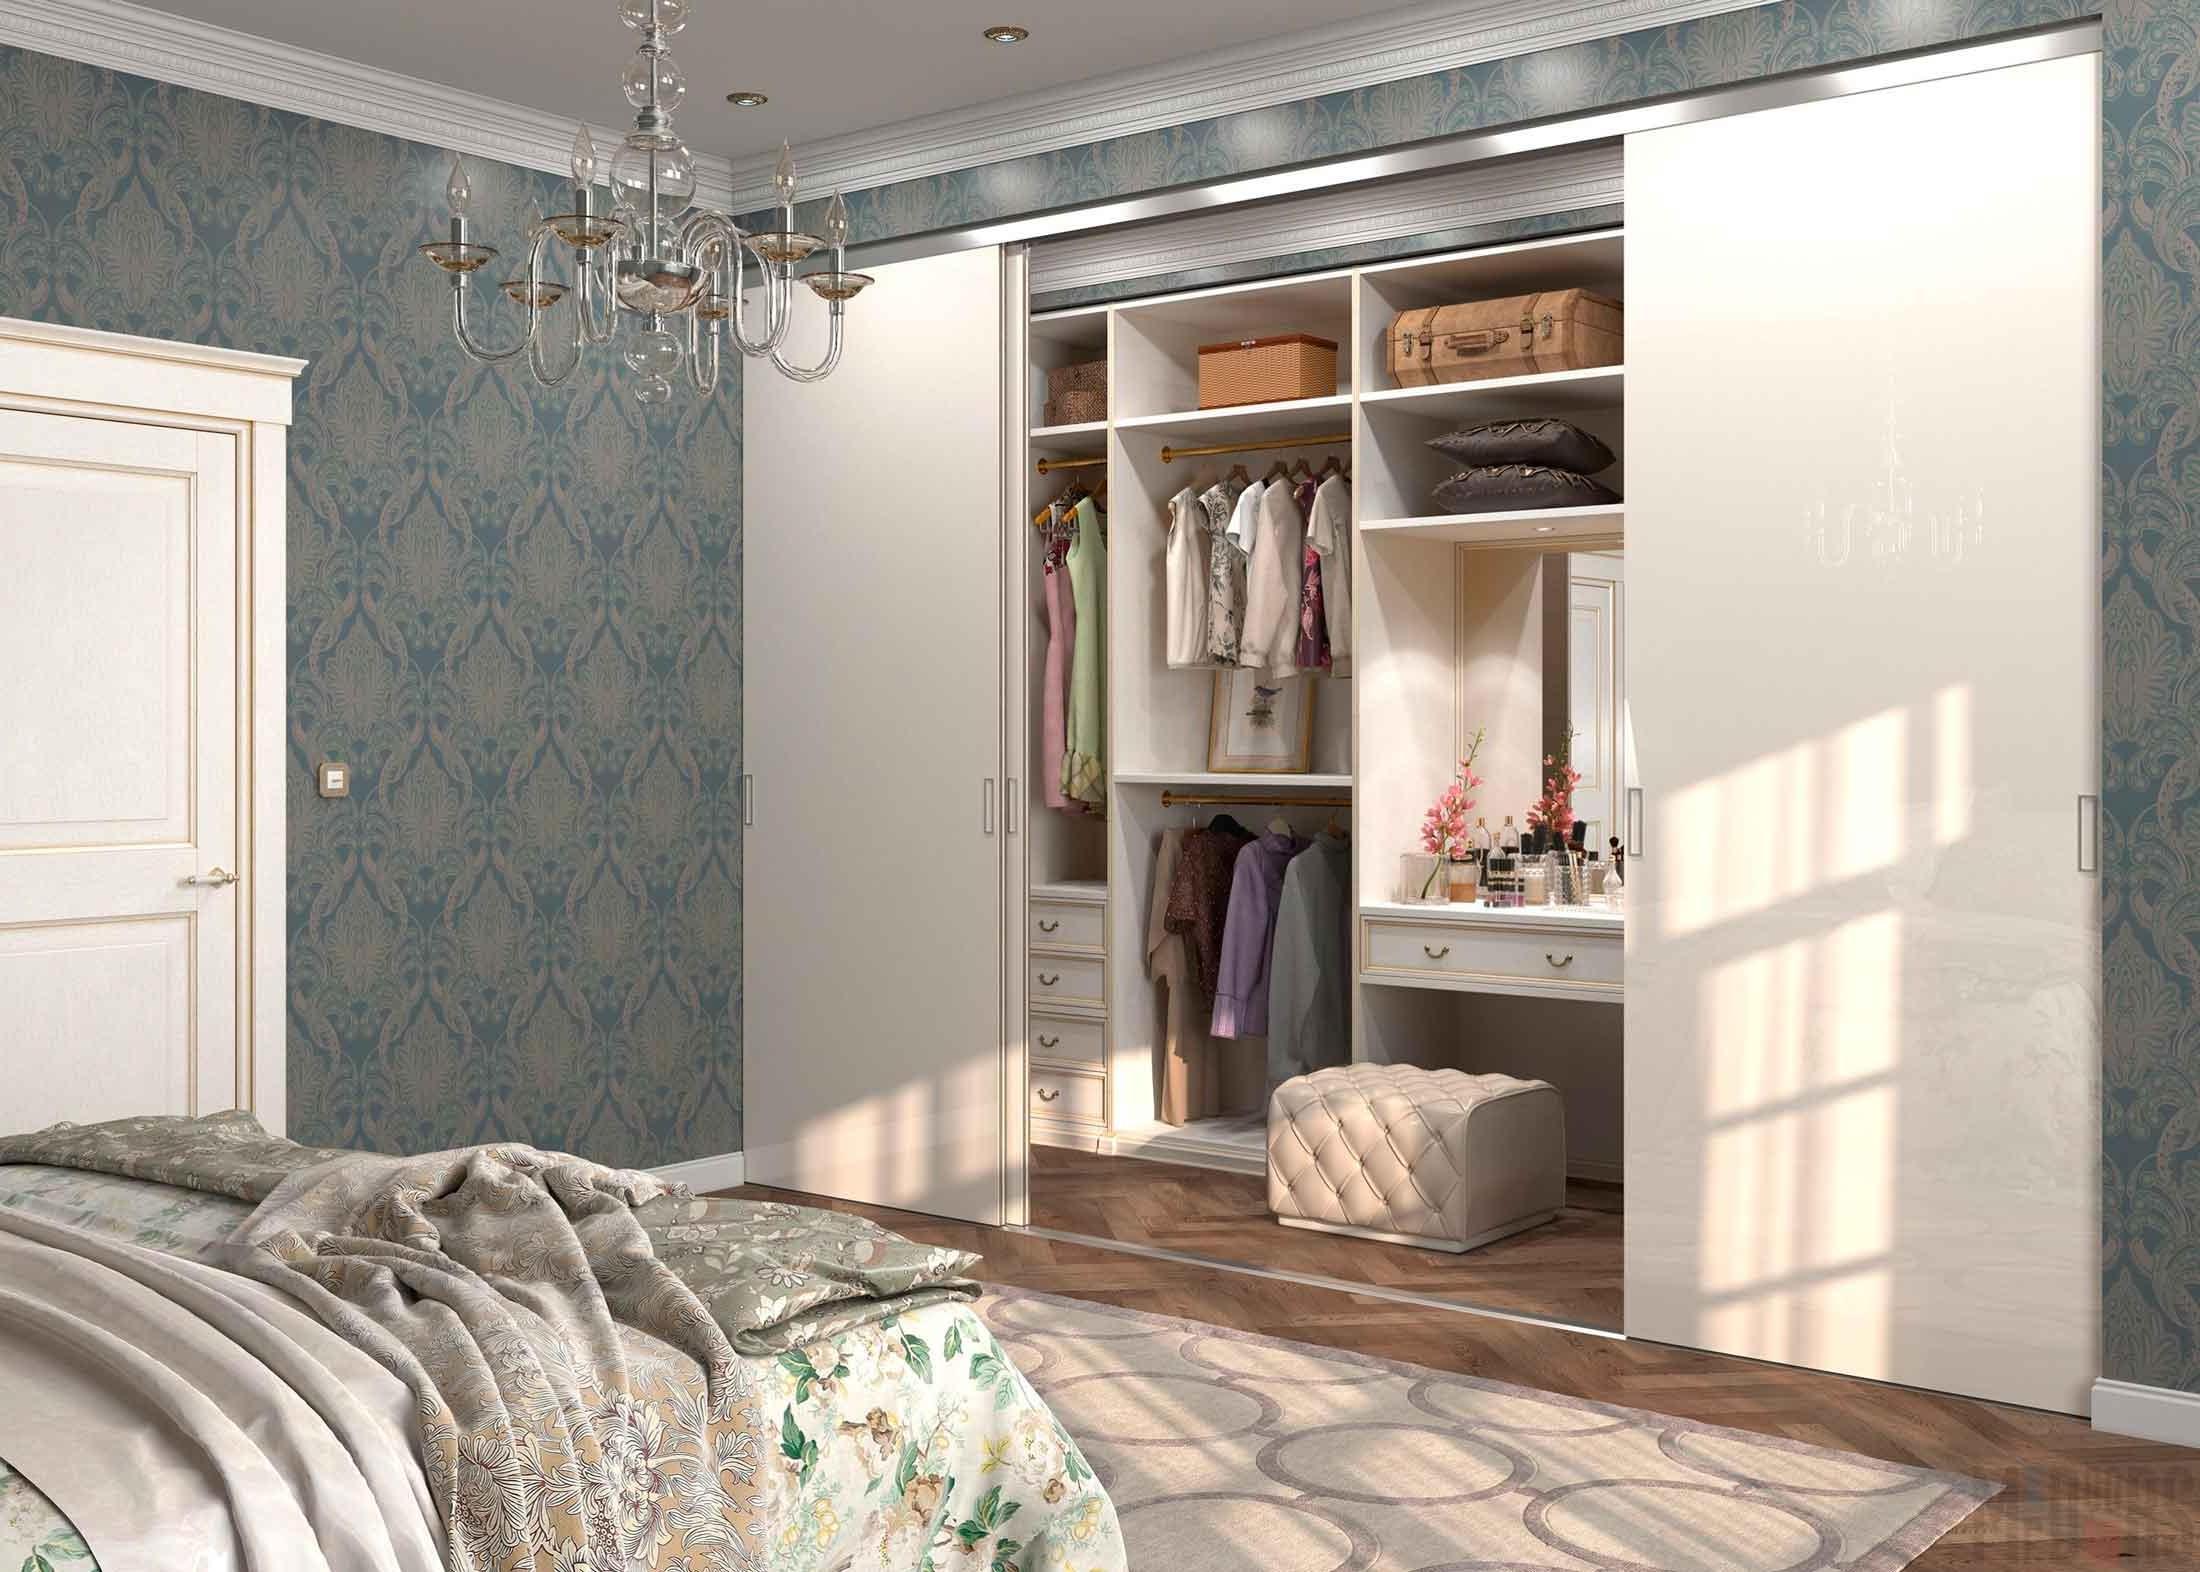 Bedroom interior with built-in wardrobe